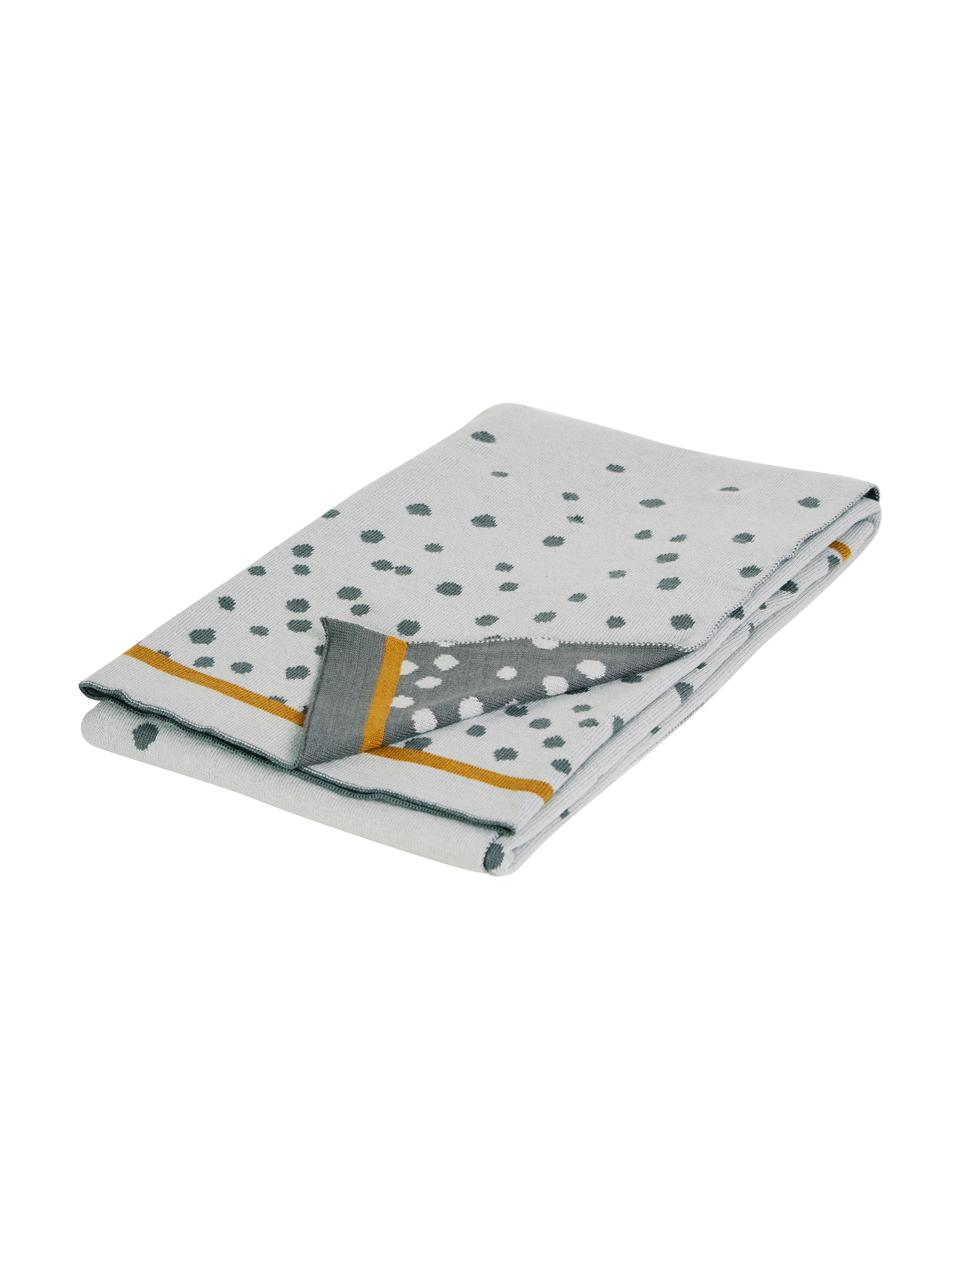 Strickdecke Happy Dots, Webart: Jacquard, Grau, 80 x 100 cm